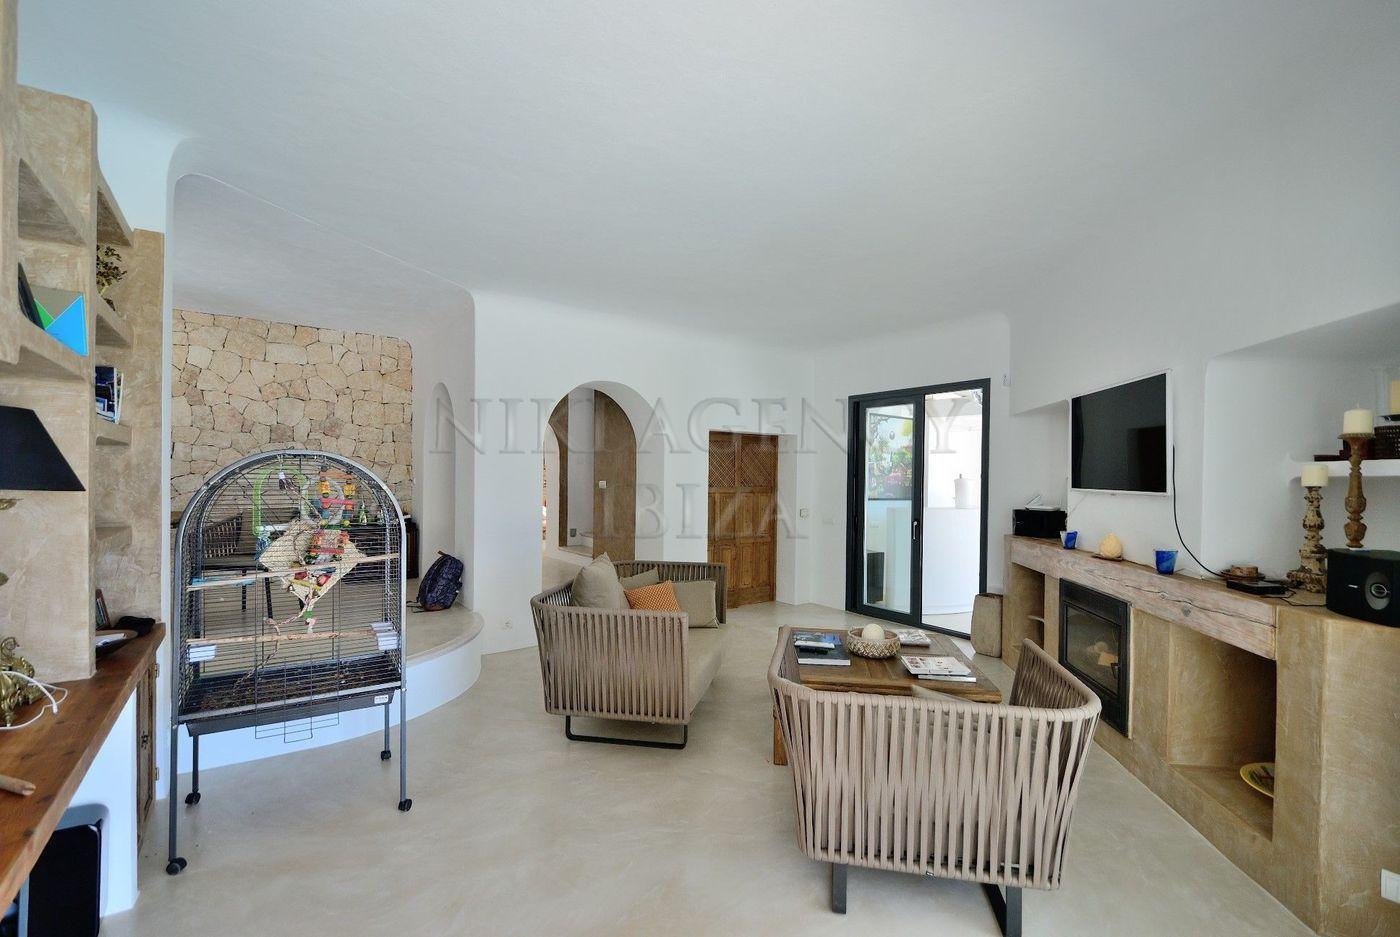 9. House for sale in Sant Josep de sa Talaia Ibiza - Fantastic 4 Bed Villa For Sale in Sant Josep de sa Talaia, Ibiza!